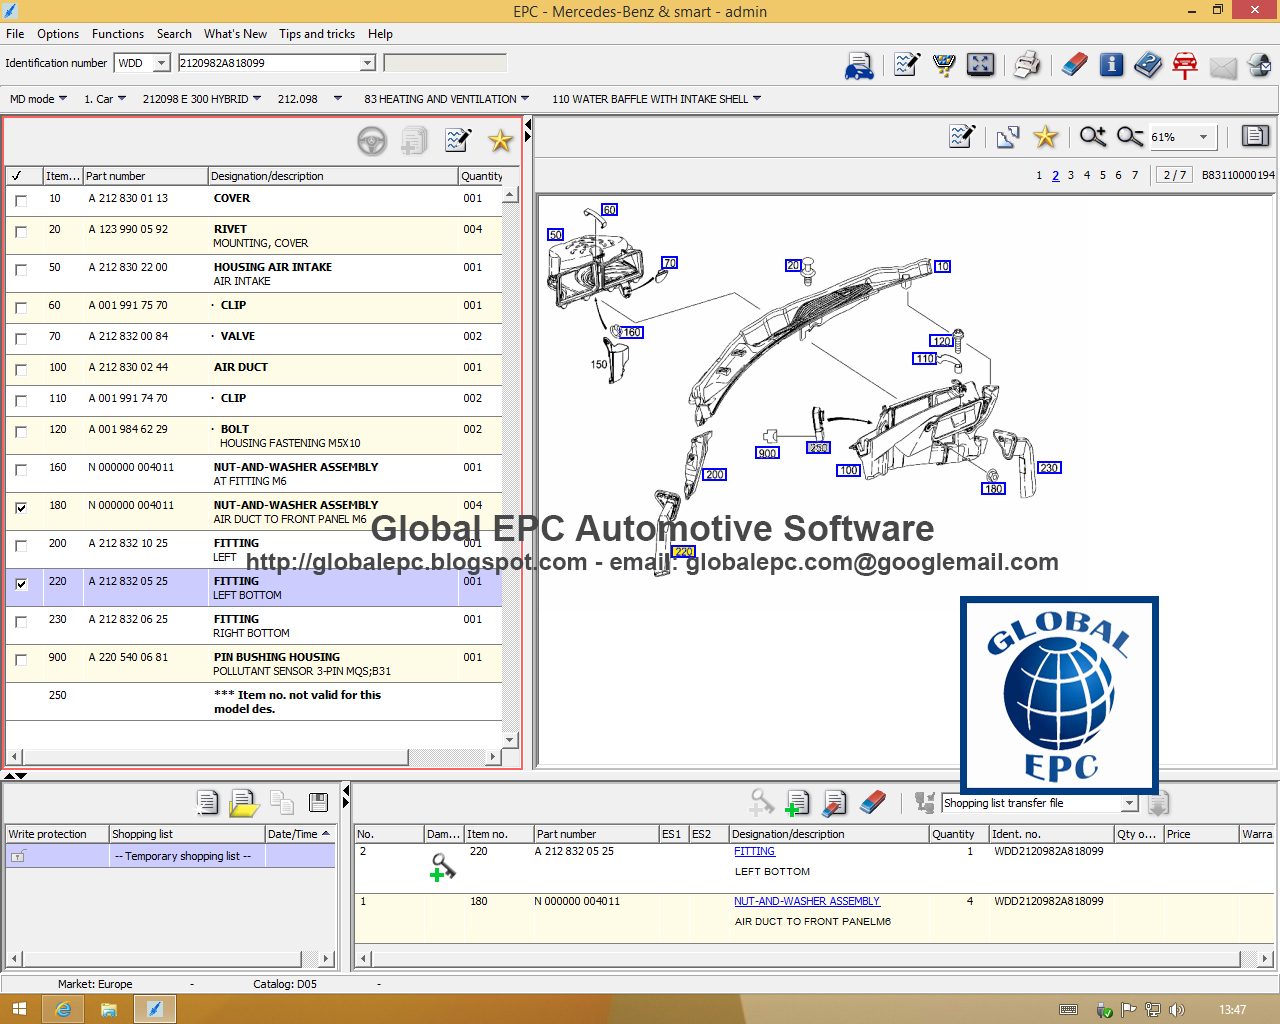 Global epc automotive software mercedes benz smart ewanet for Mercedes benz software